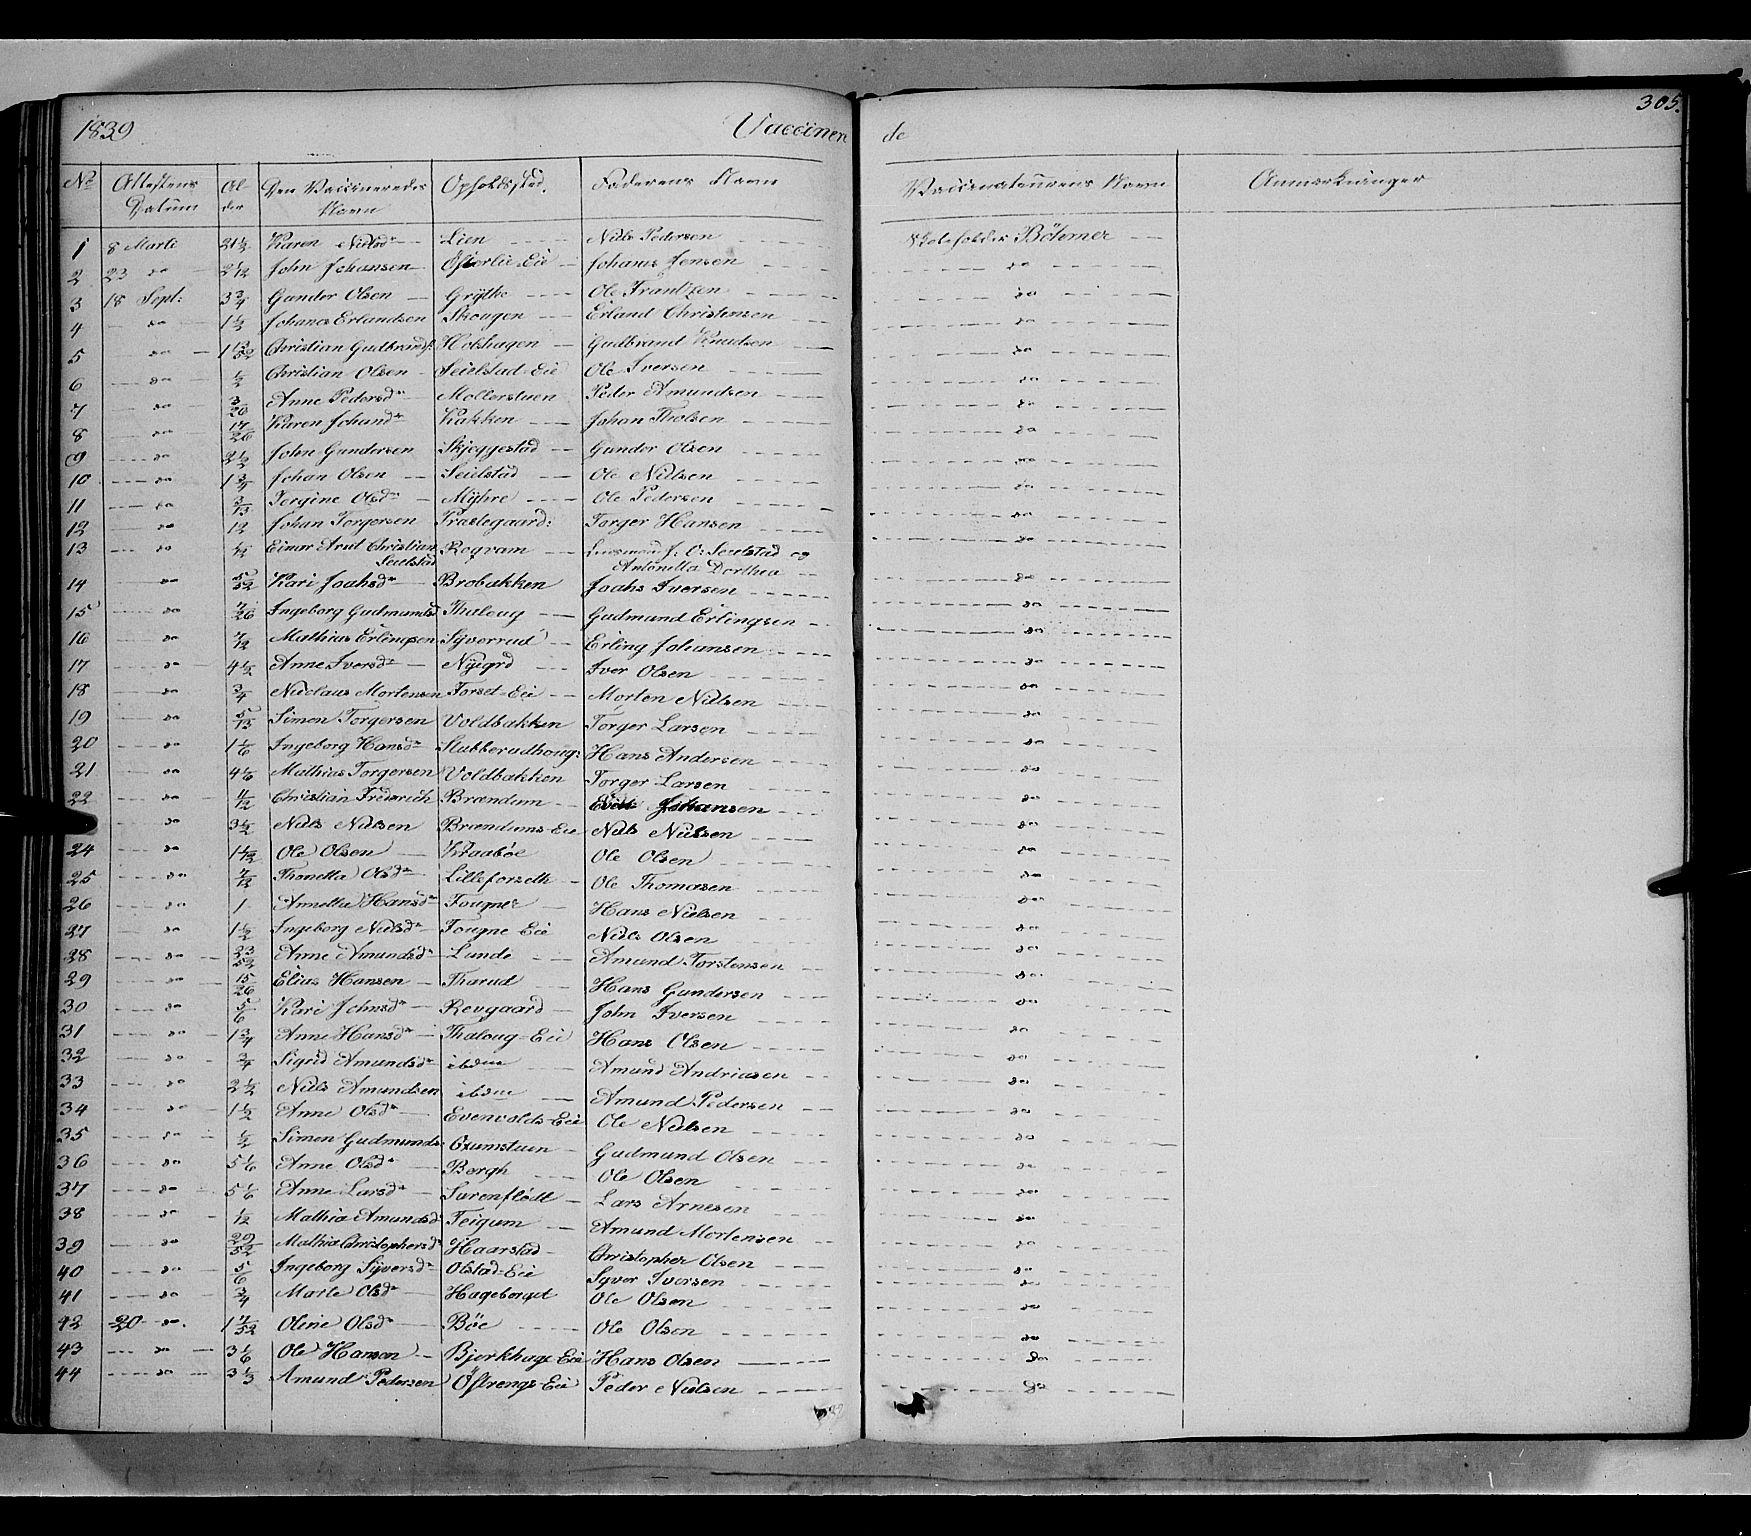 SAH, Gausdal prestekontor, Ministerialbok nr. 7, 1840-1850, s. 305